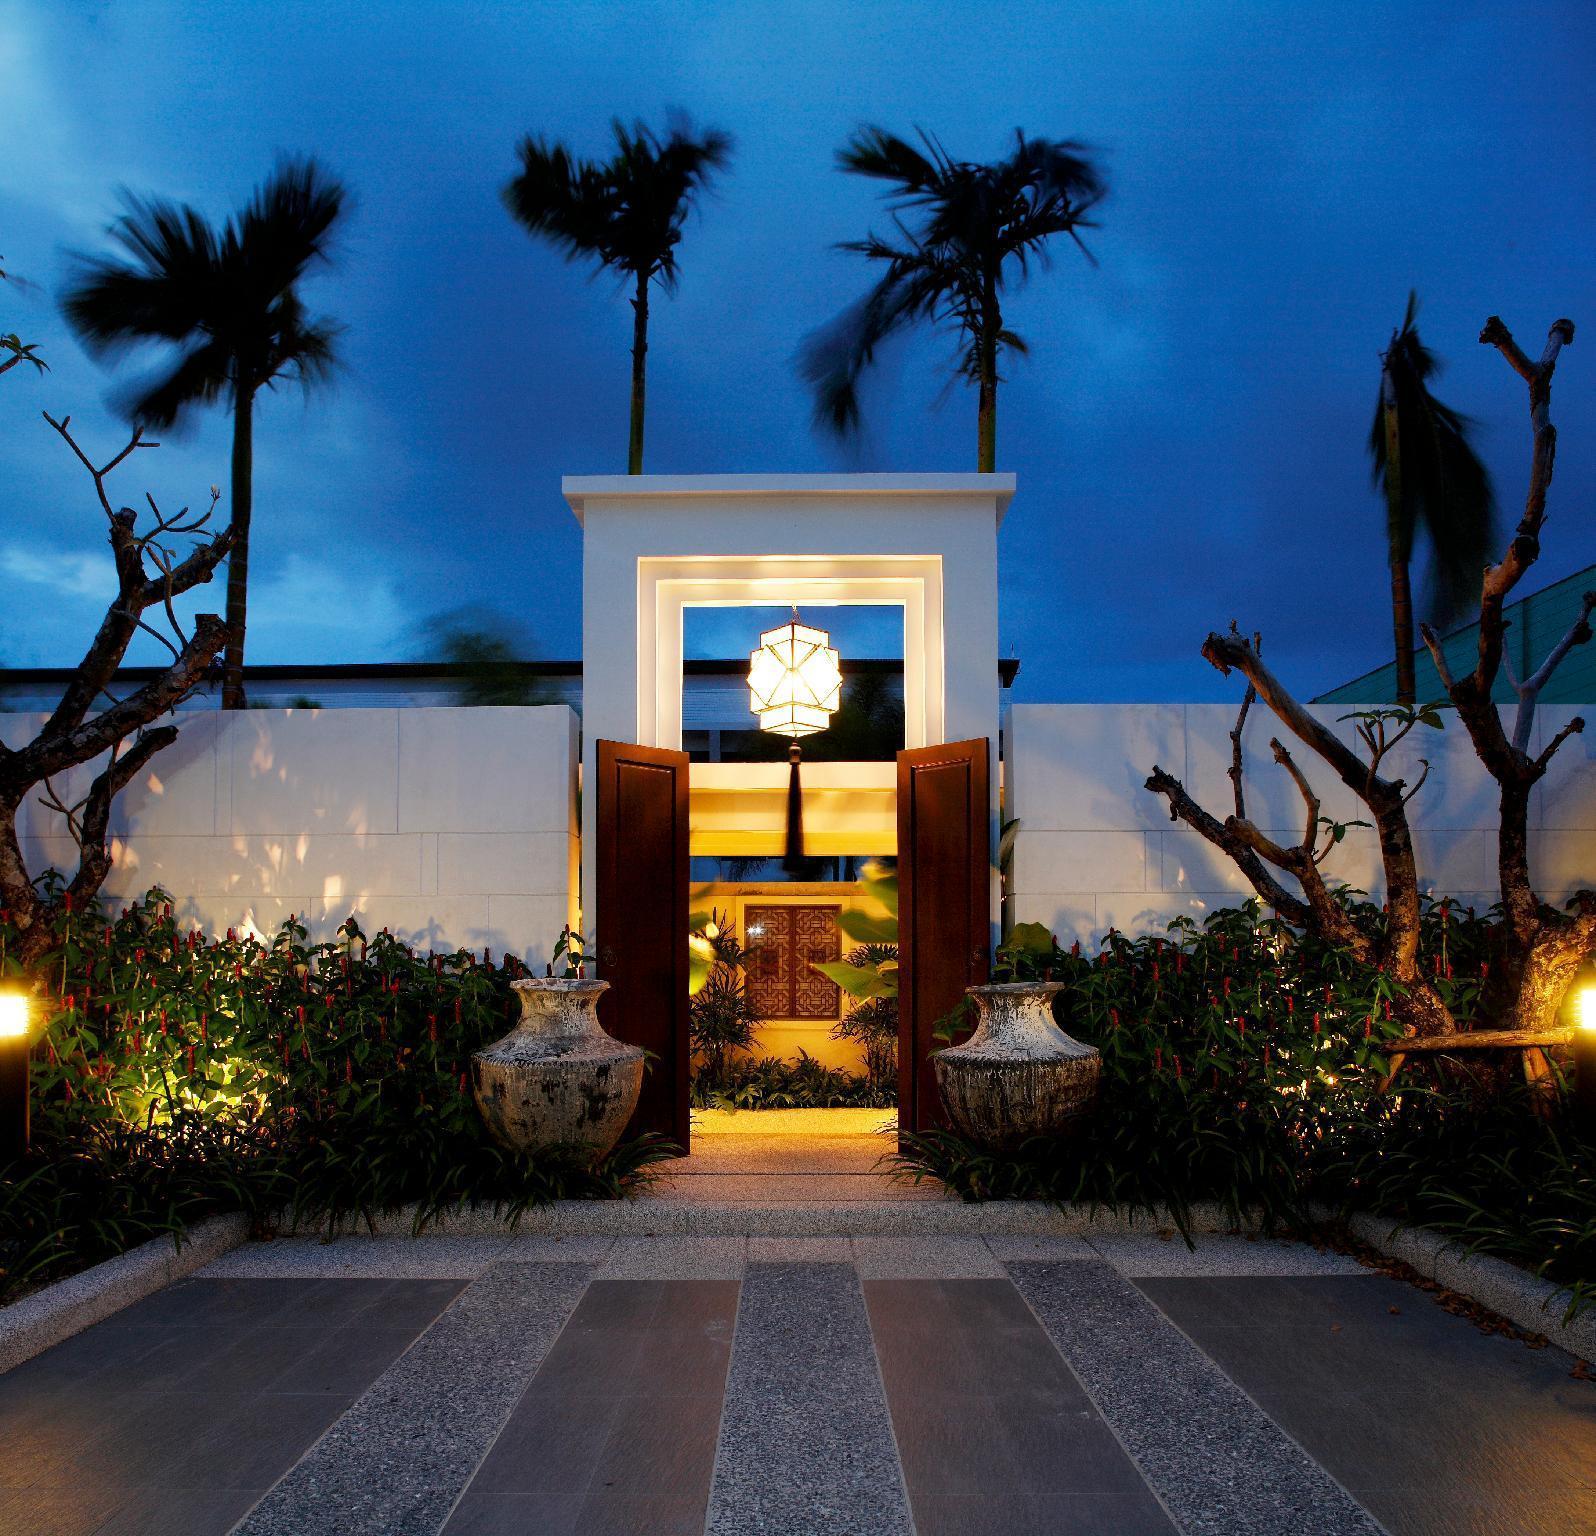 VD14  Oxygen Villa 4BR Private Pool  Bangtao Beach วิลลา 4 ห้องนอน 4 ห้องน้ำส่วนตัว ขนาด 240 ตร.ม. – บางเทา